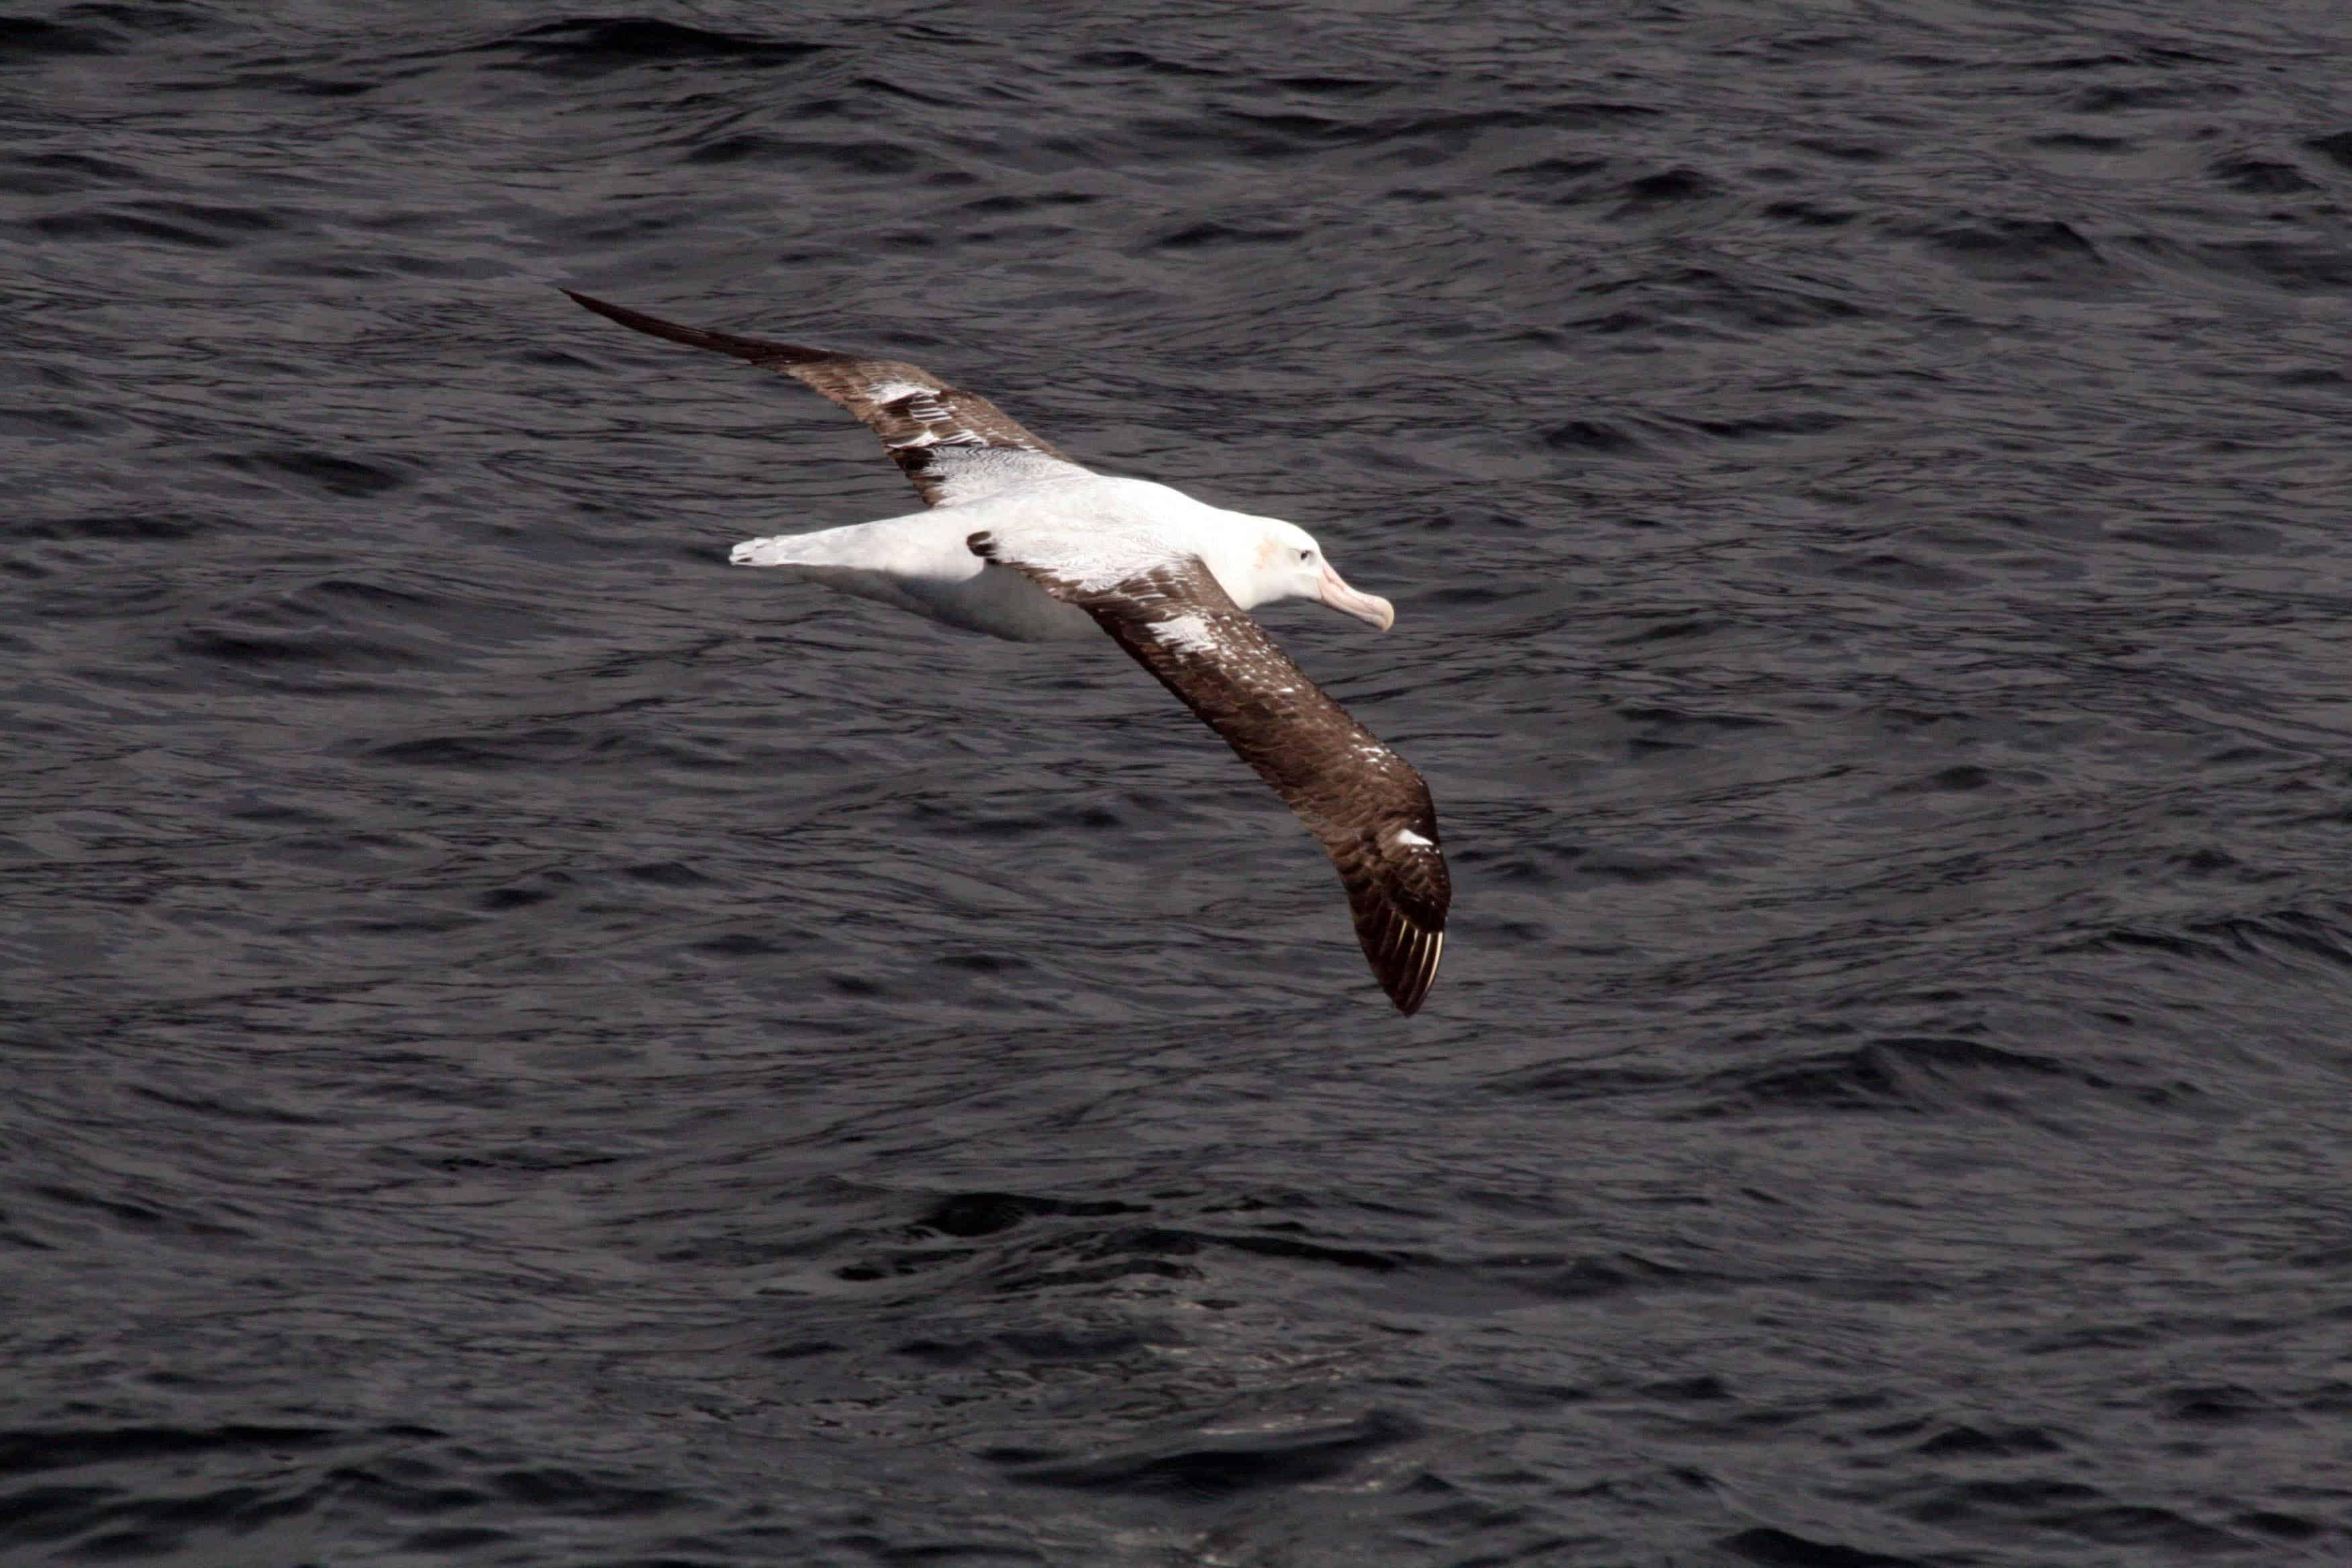 Tristan albatross Diomedea dabbenena, off Gough Island.